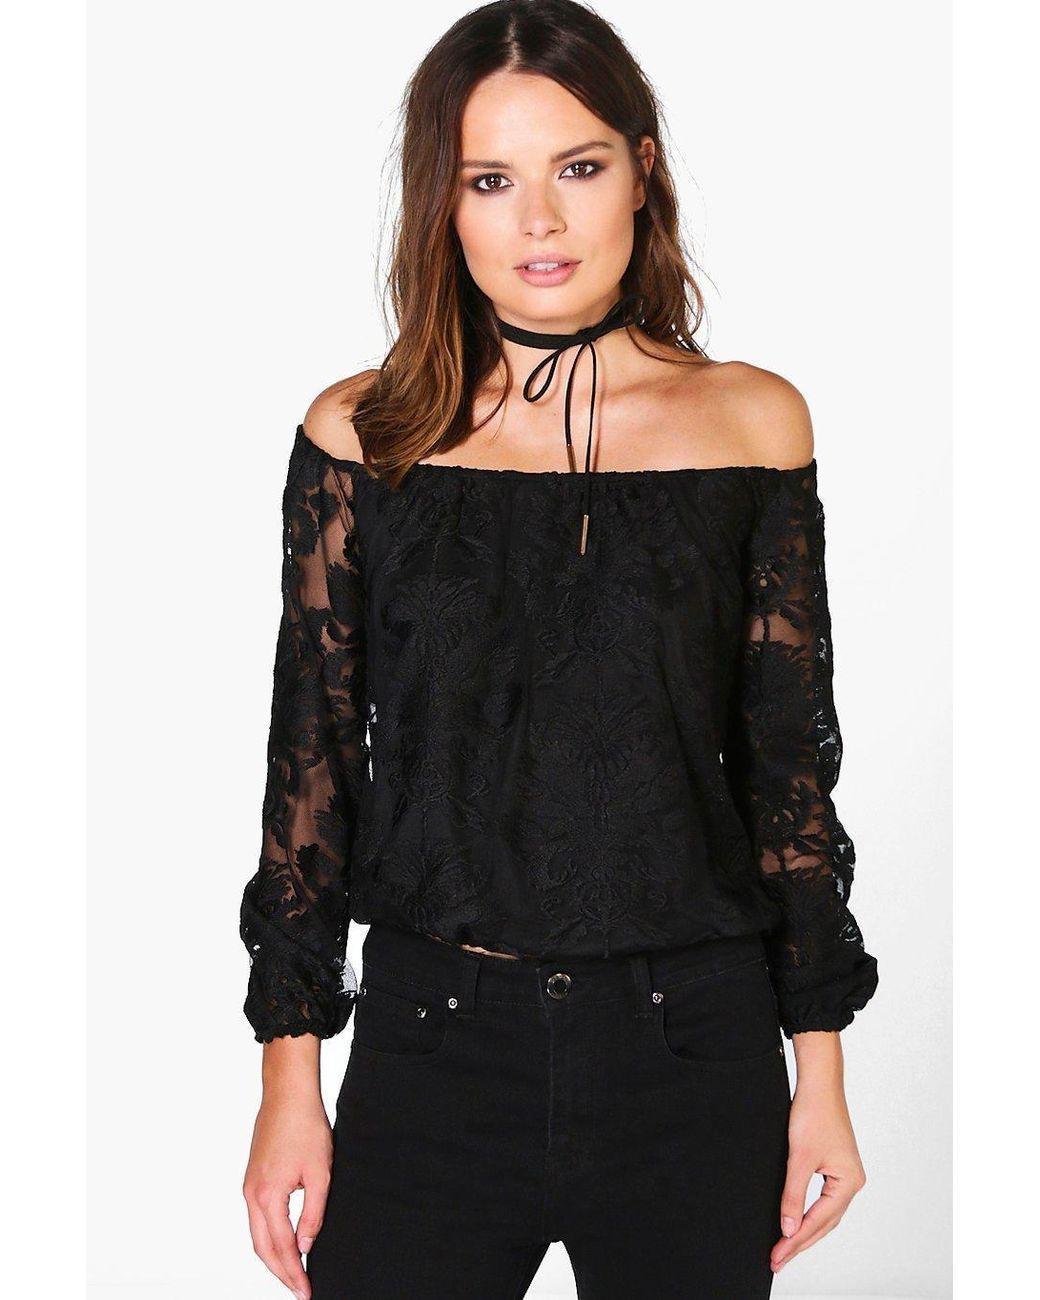 a080517e43236 Women s Black All Over Lace Bardot Top